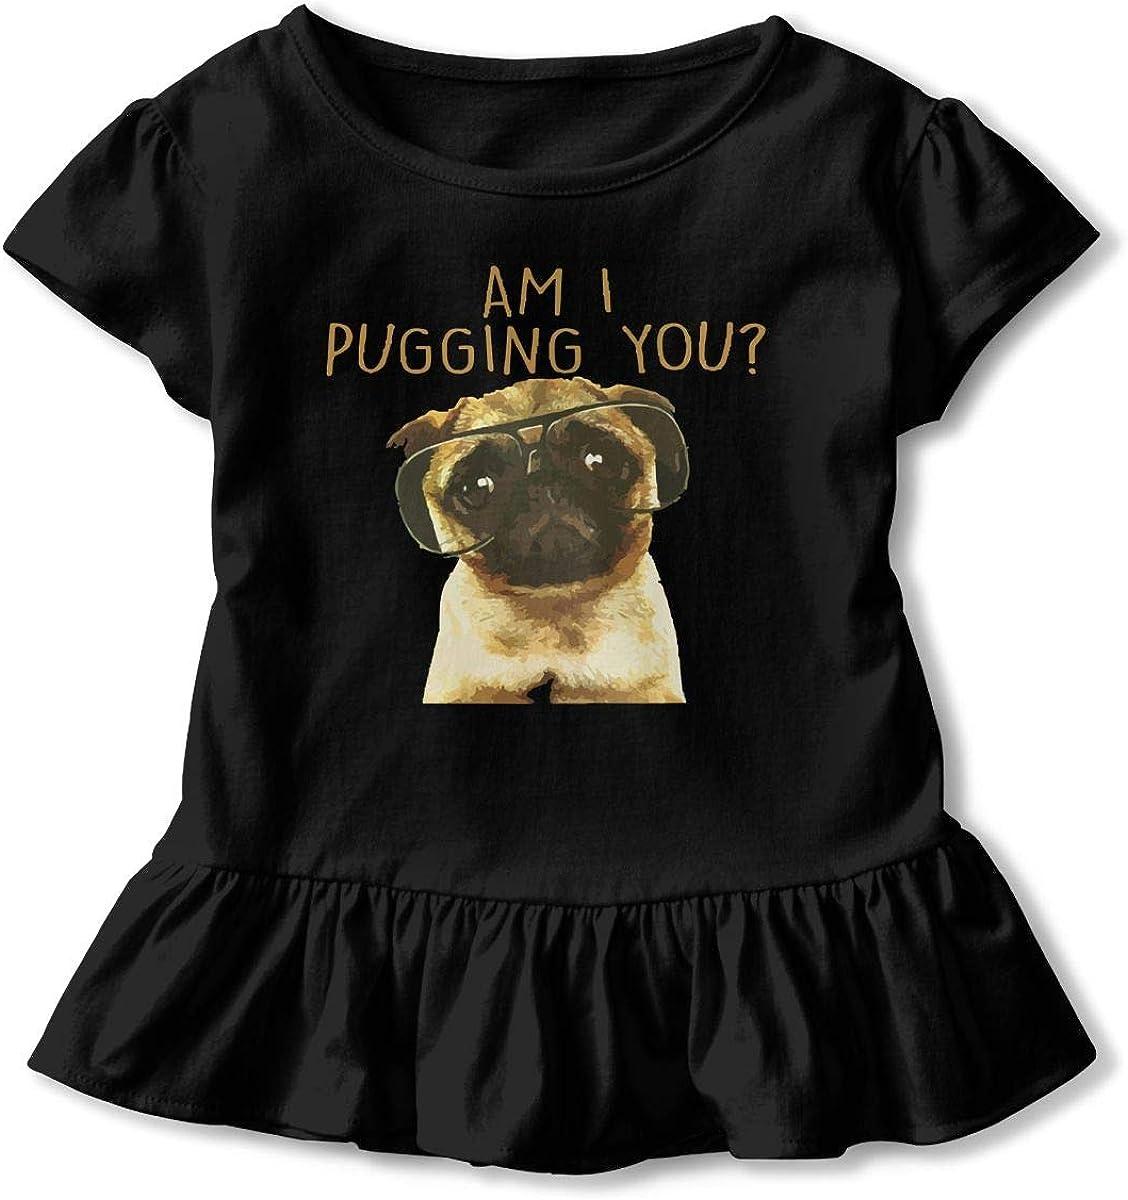 Am I Pugging You Pug Toddler Girls T Shirt Kids Cotton Short Sleeve Ruffle Tee